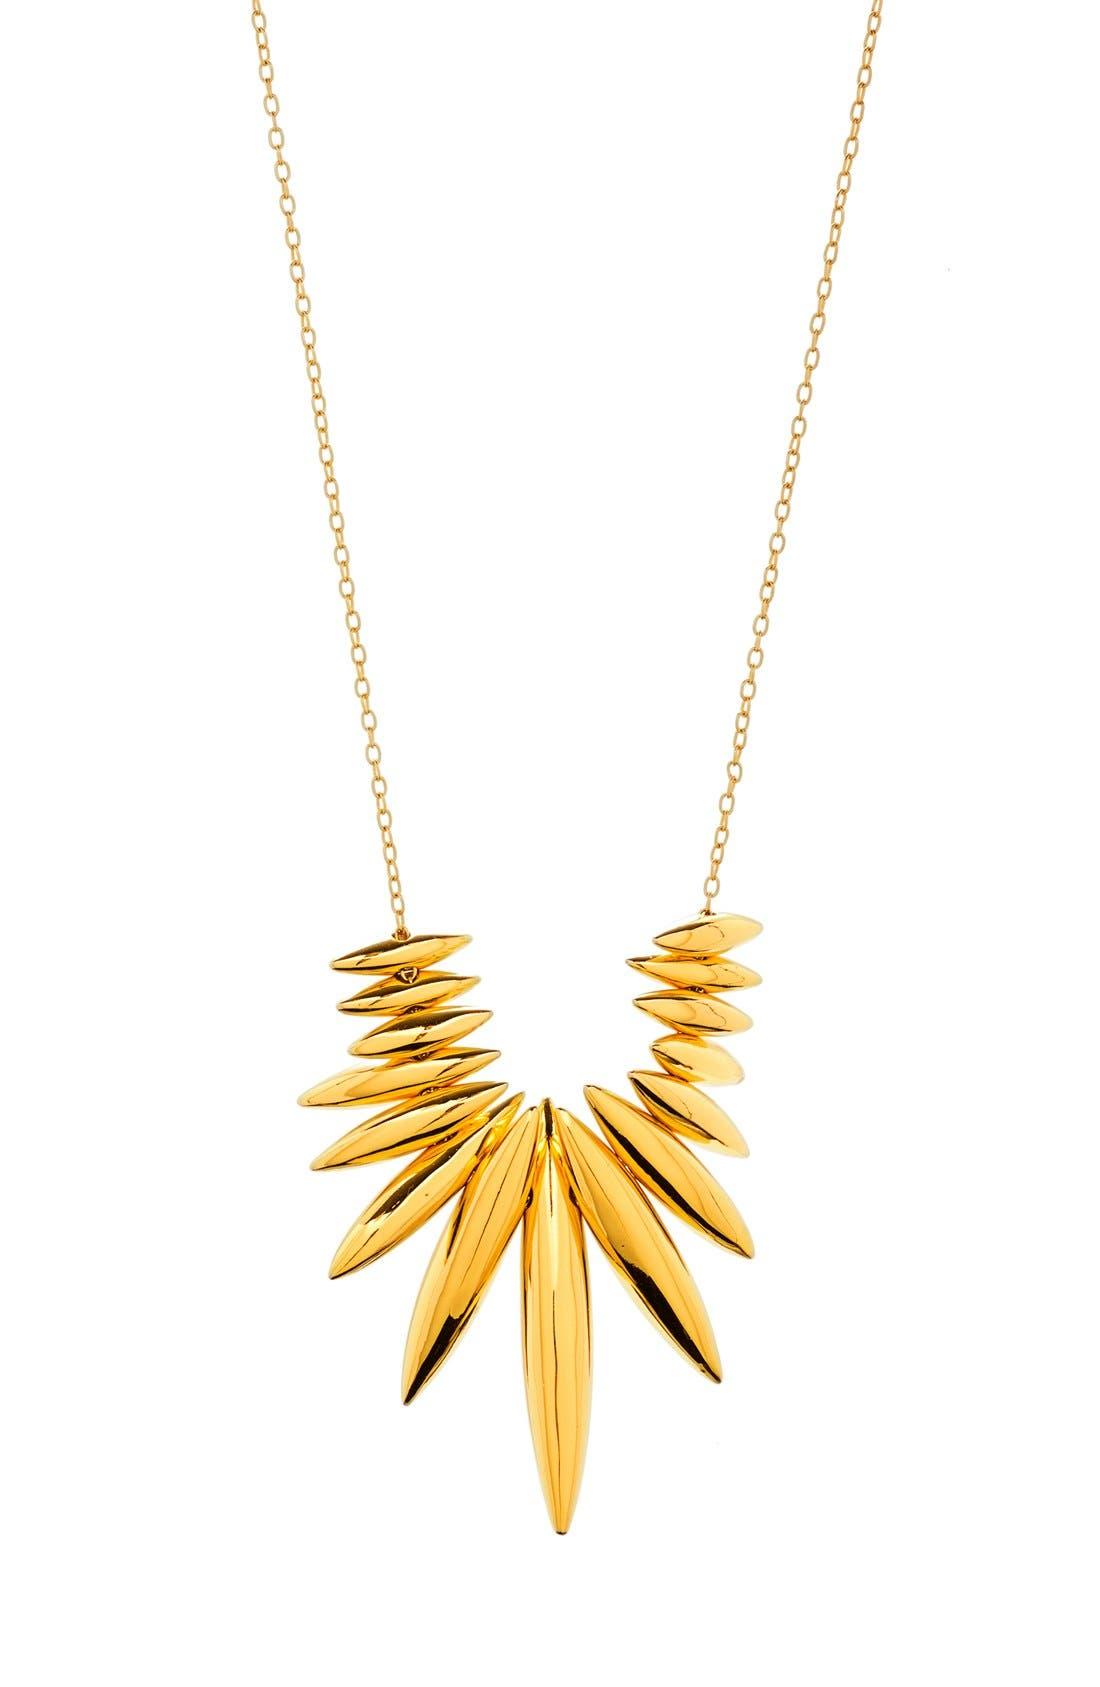 GORJANA 'Lori' Long Necklace, Main, color, 710